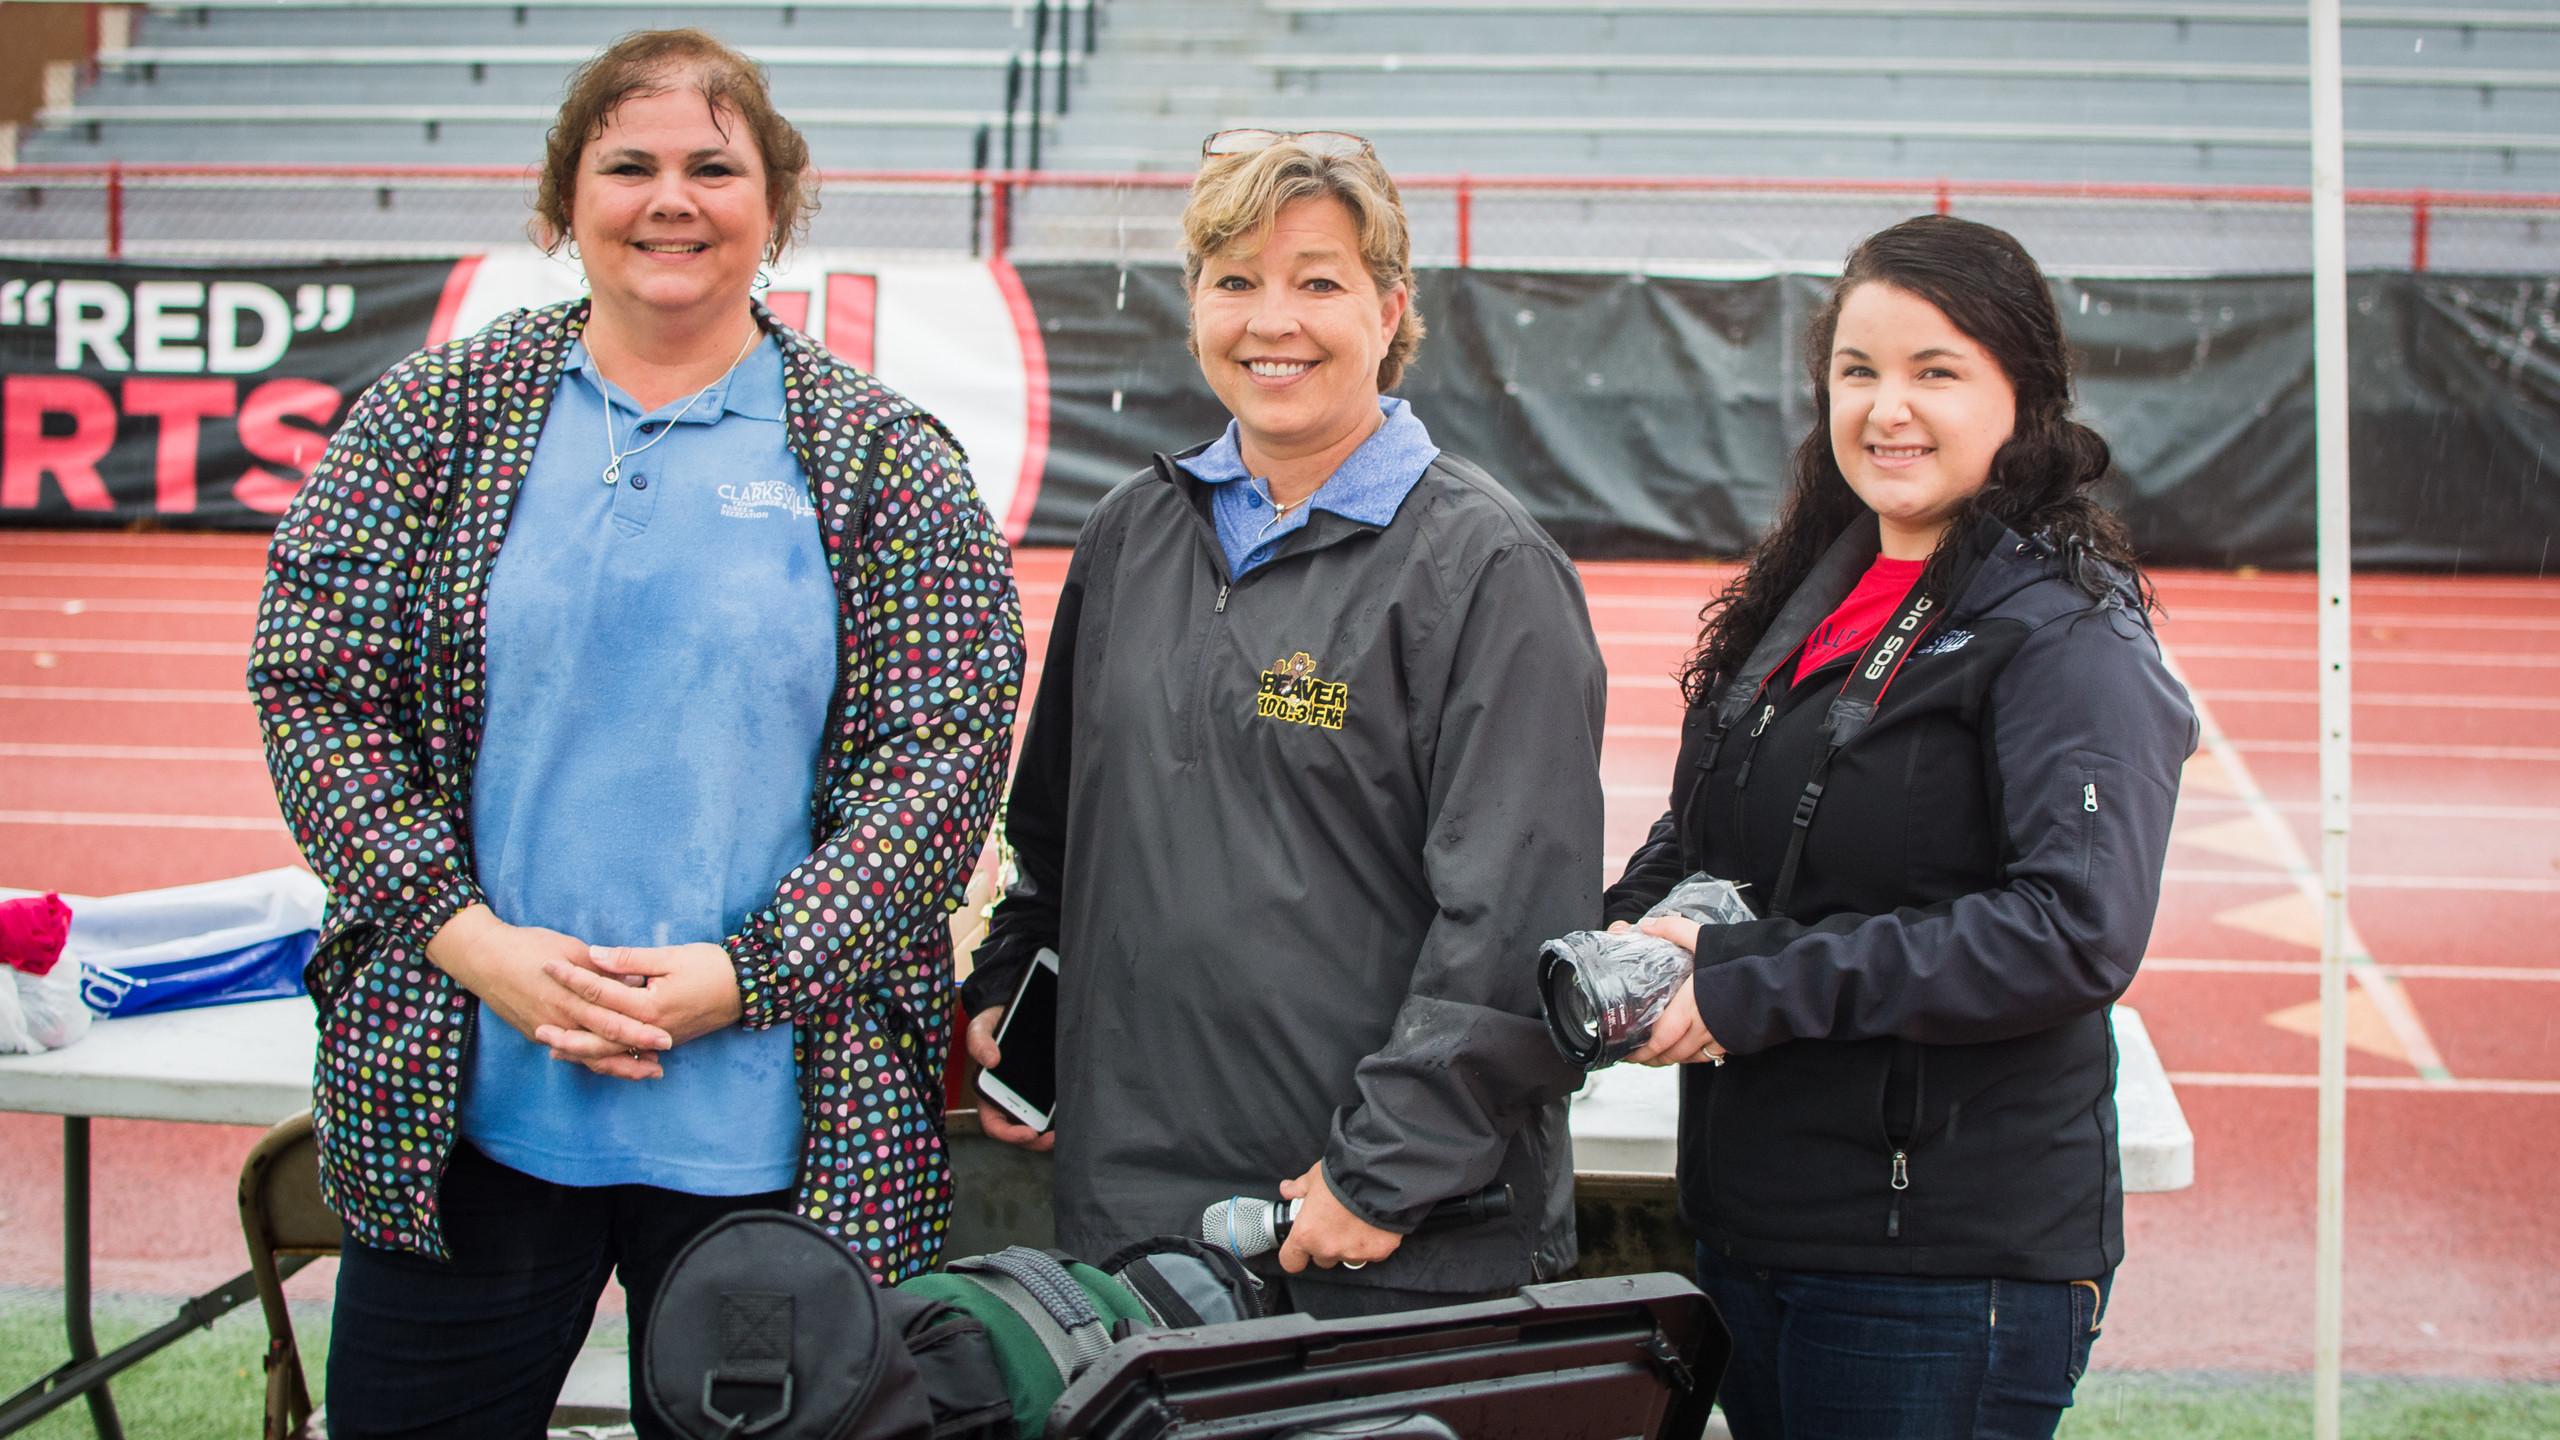 Tina Boycha, Monica Reed, and Kaylee Dowdy